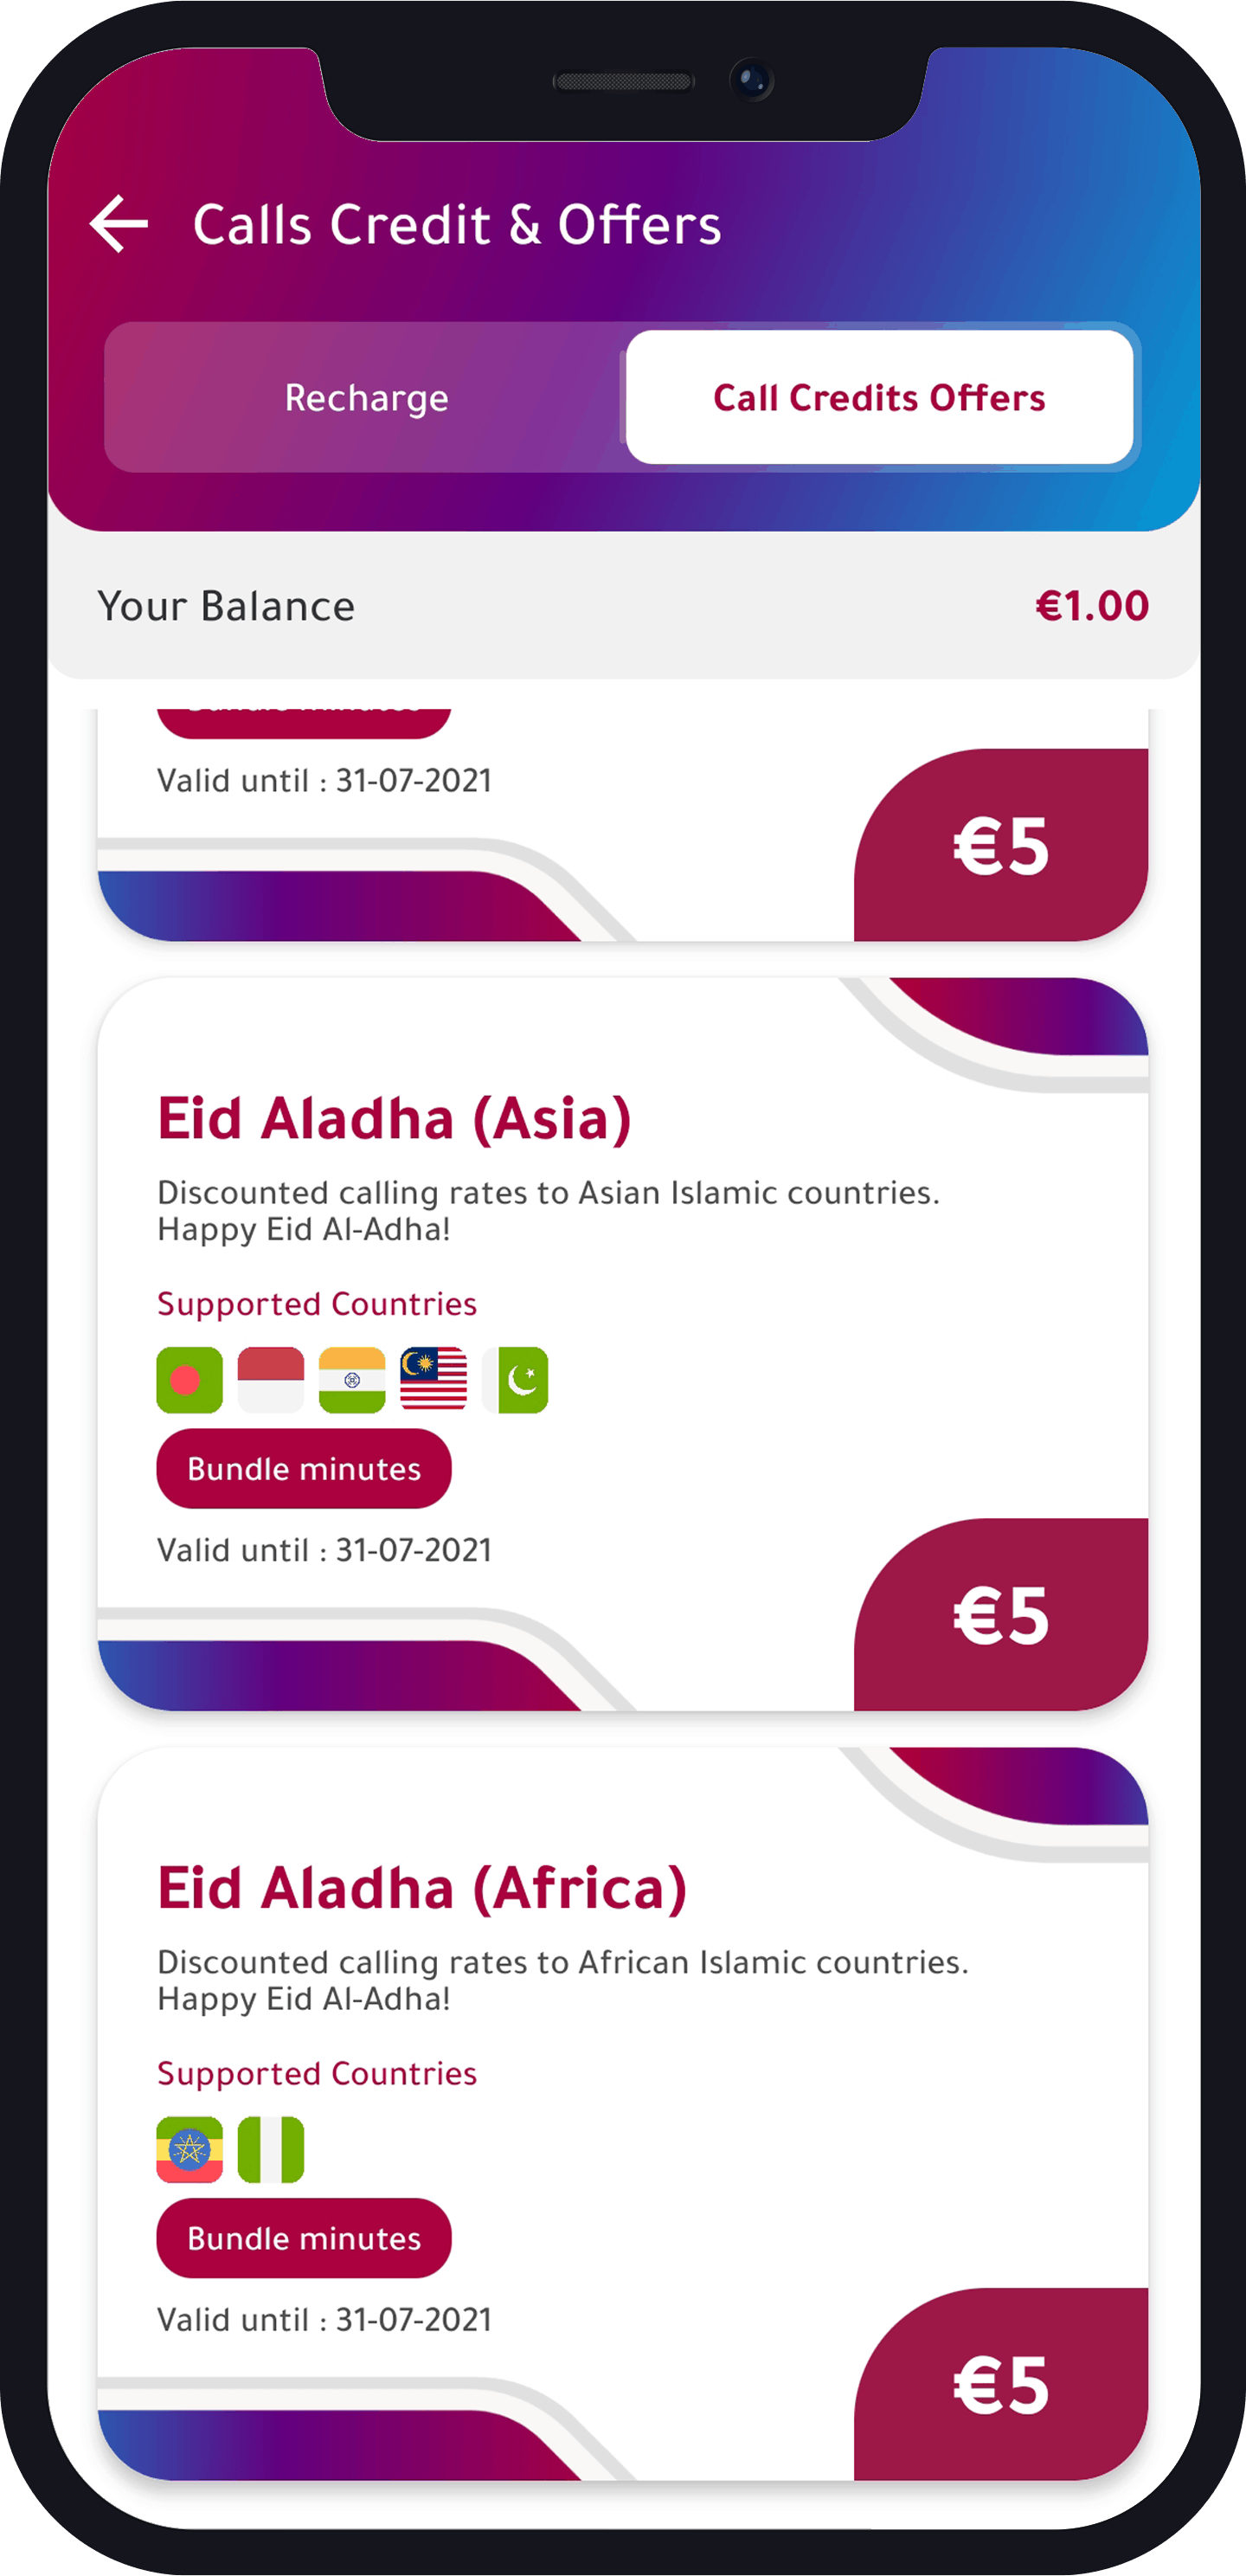 Eid Al-Adha Call Offers from Numero